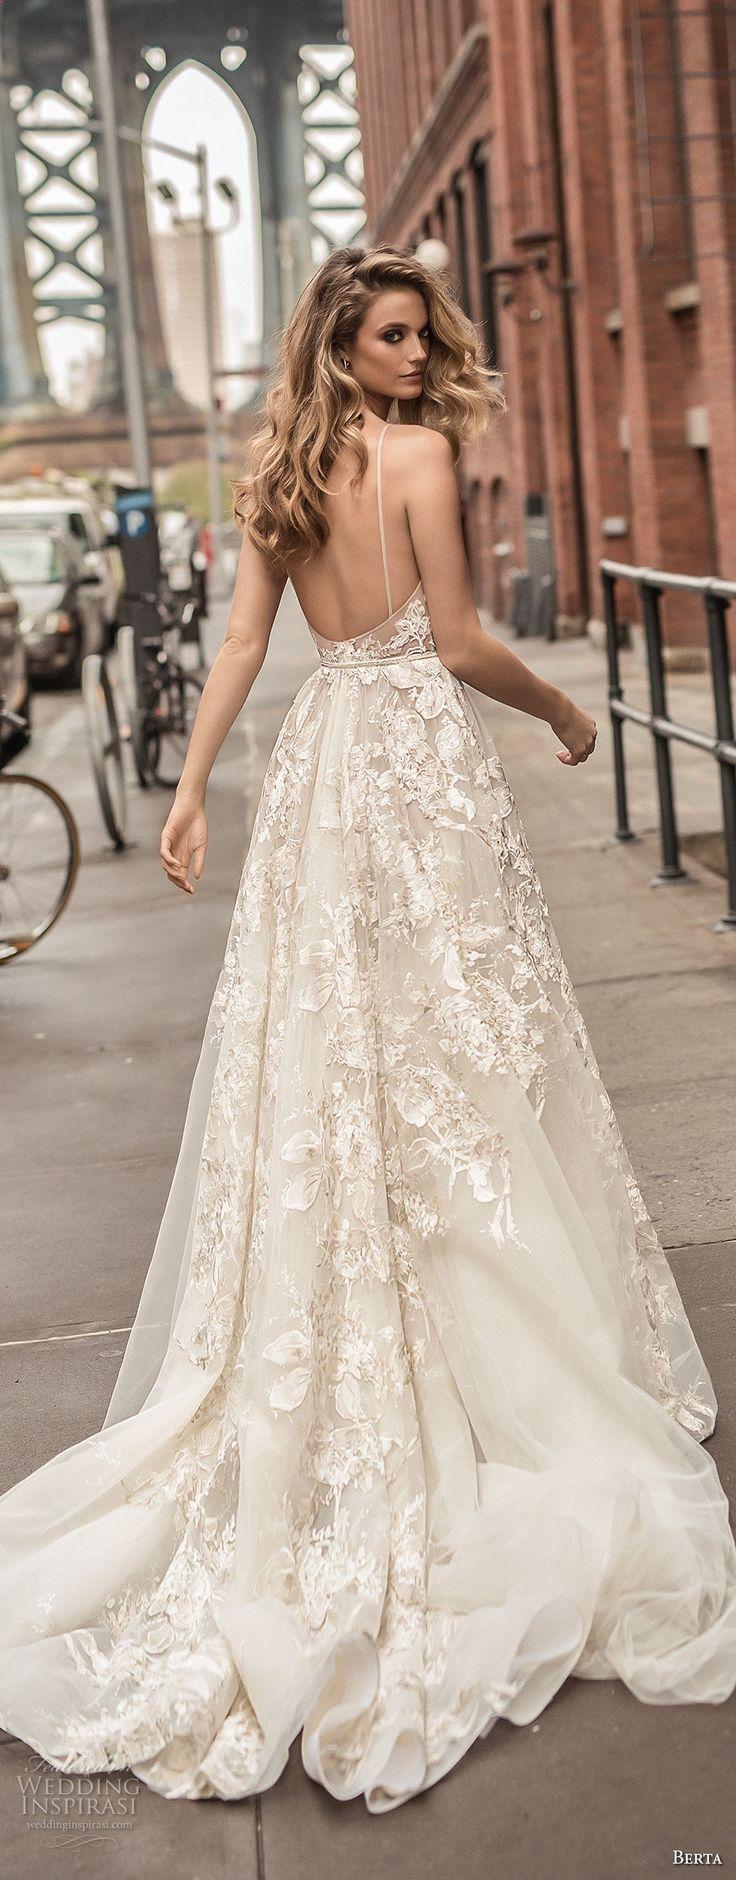 Mariage - Sexy Dresses